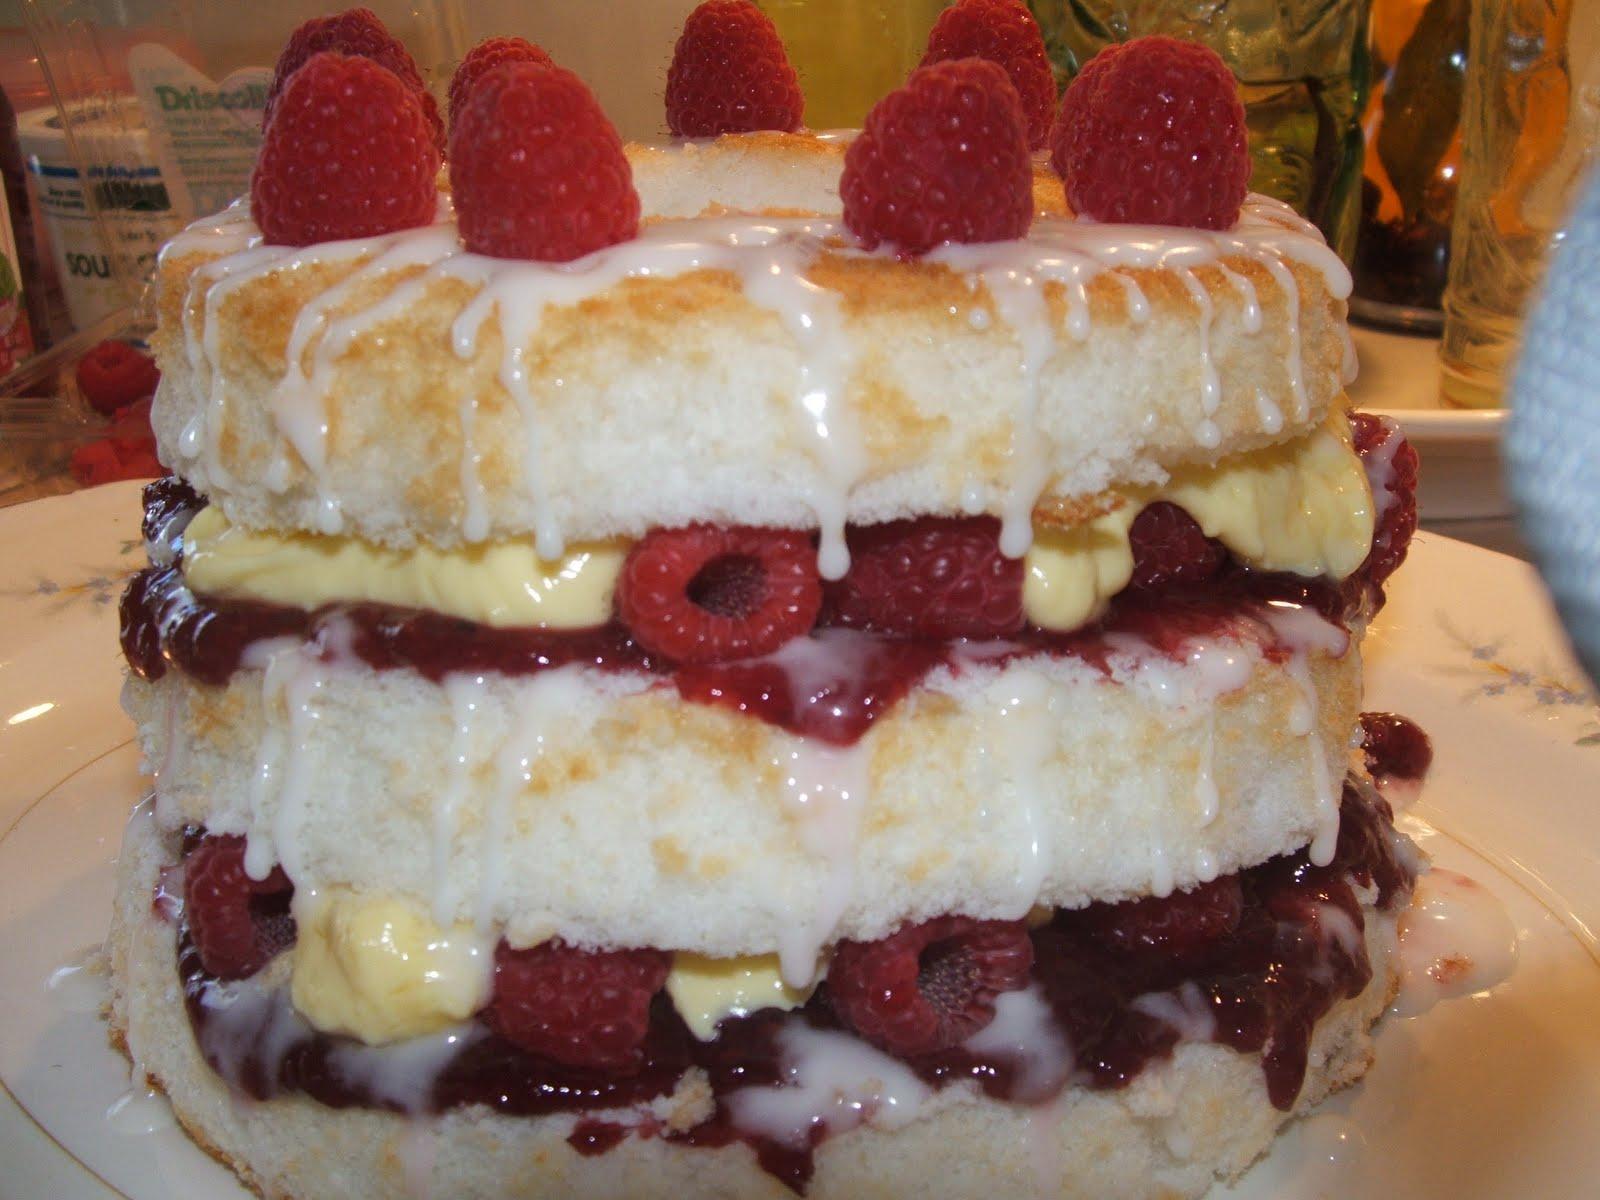 Heaven's Walk: Raspberry-Lime Birthday Cake at Heaven's Walk